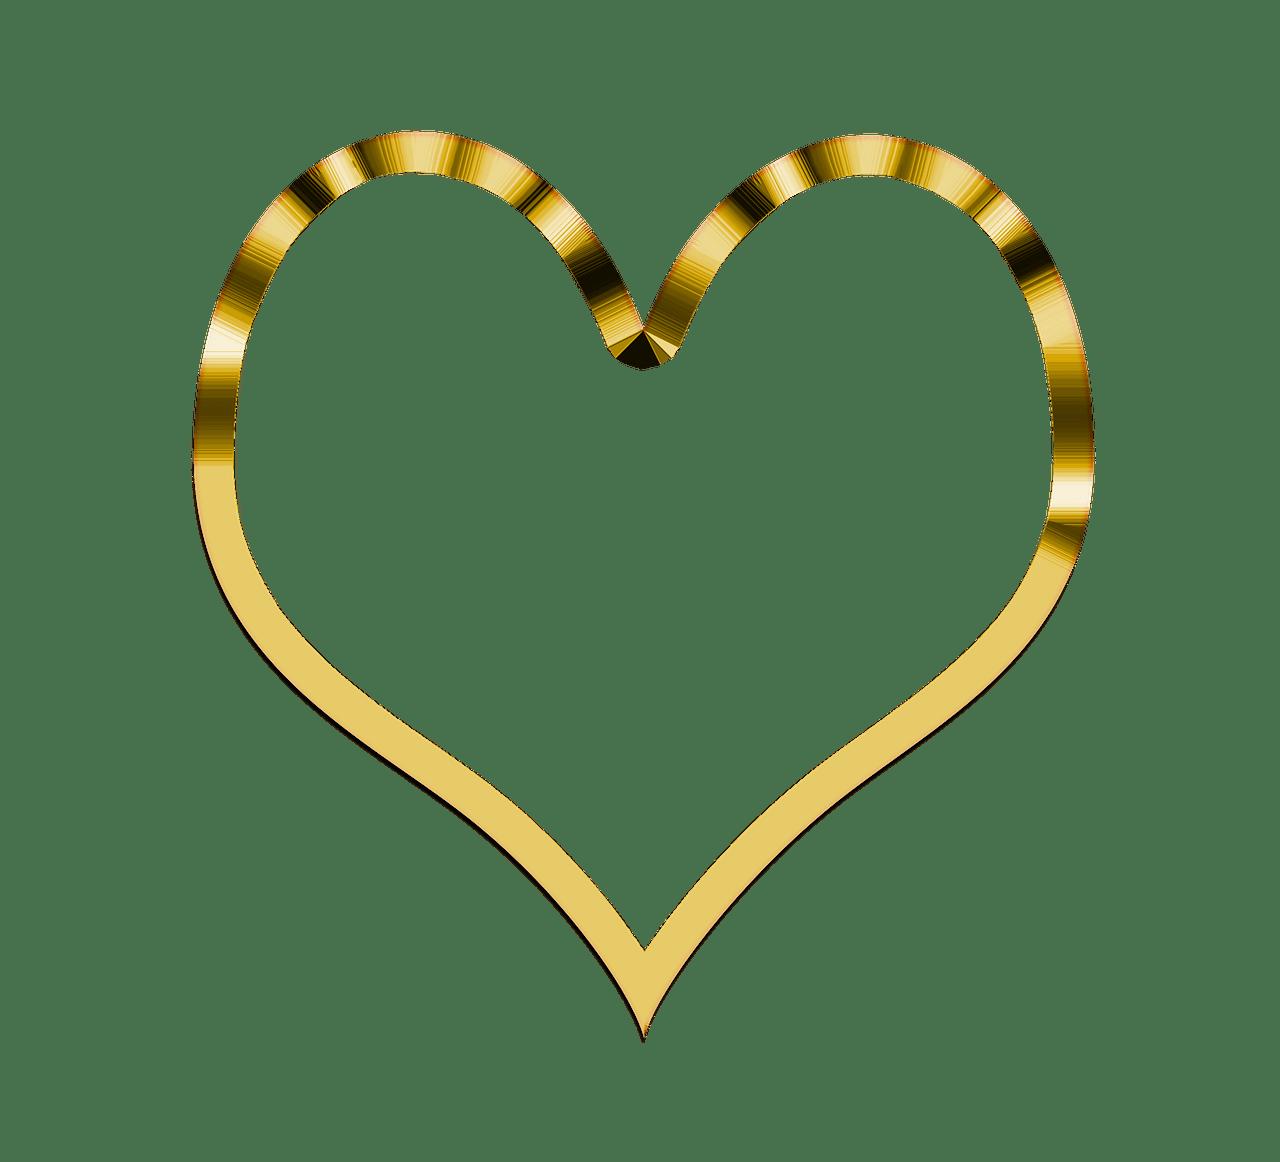 Simple heart clipart image transparent stock Heart Simple Golden transparent PNG - StickPNG image transparent stock